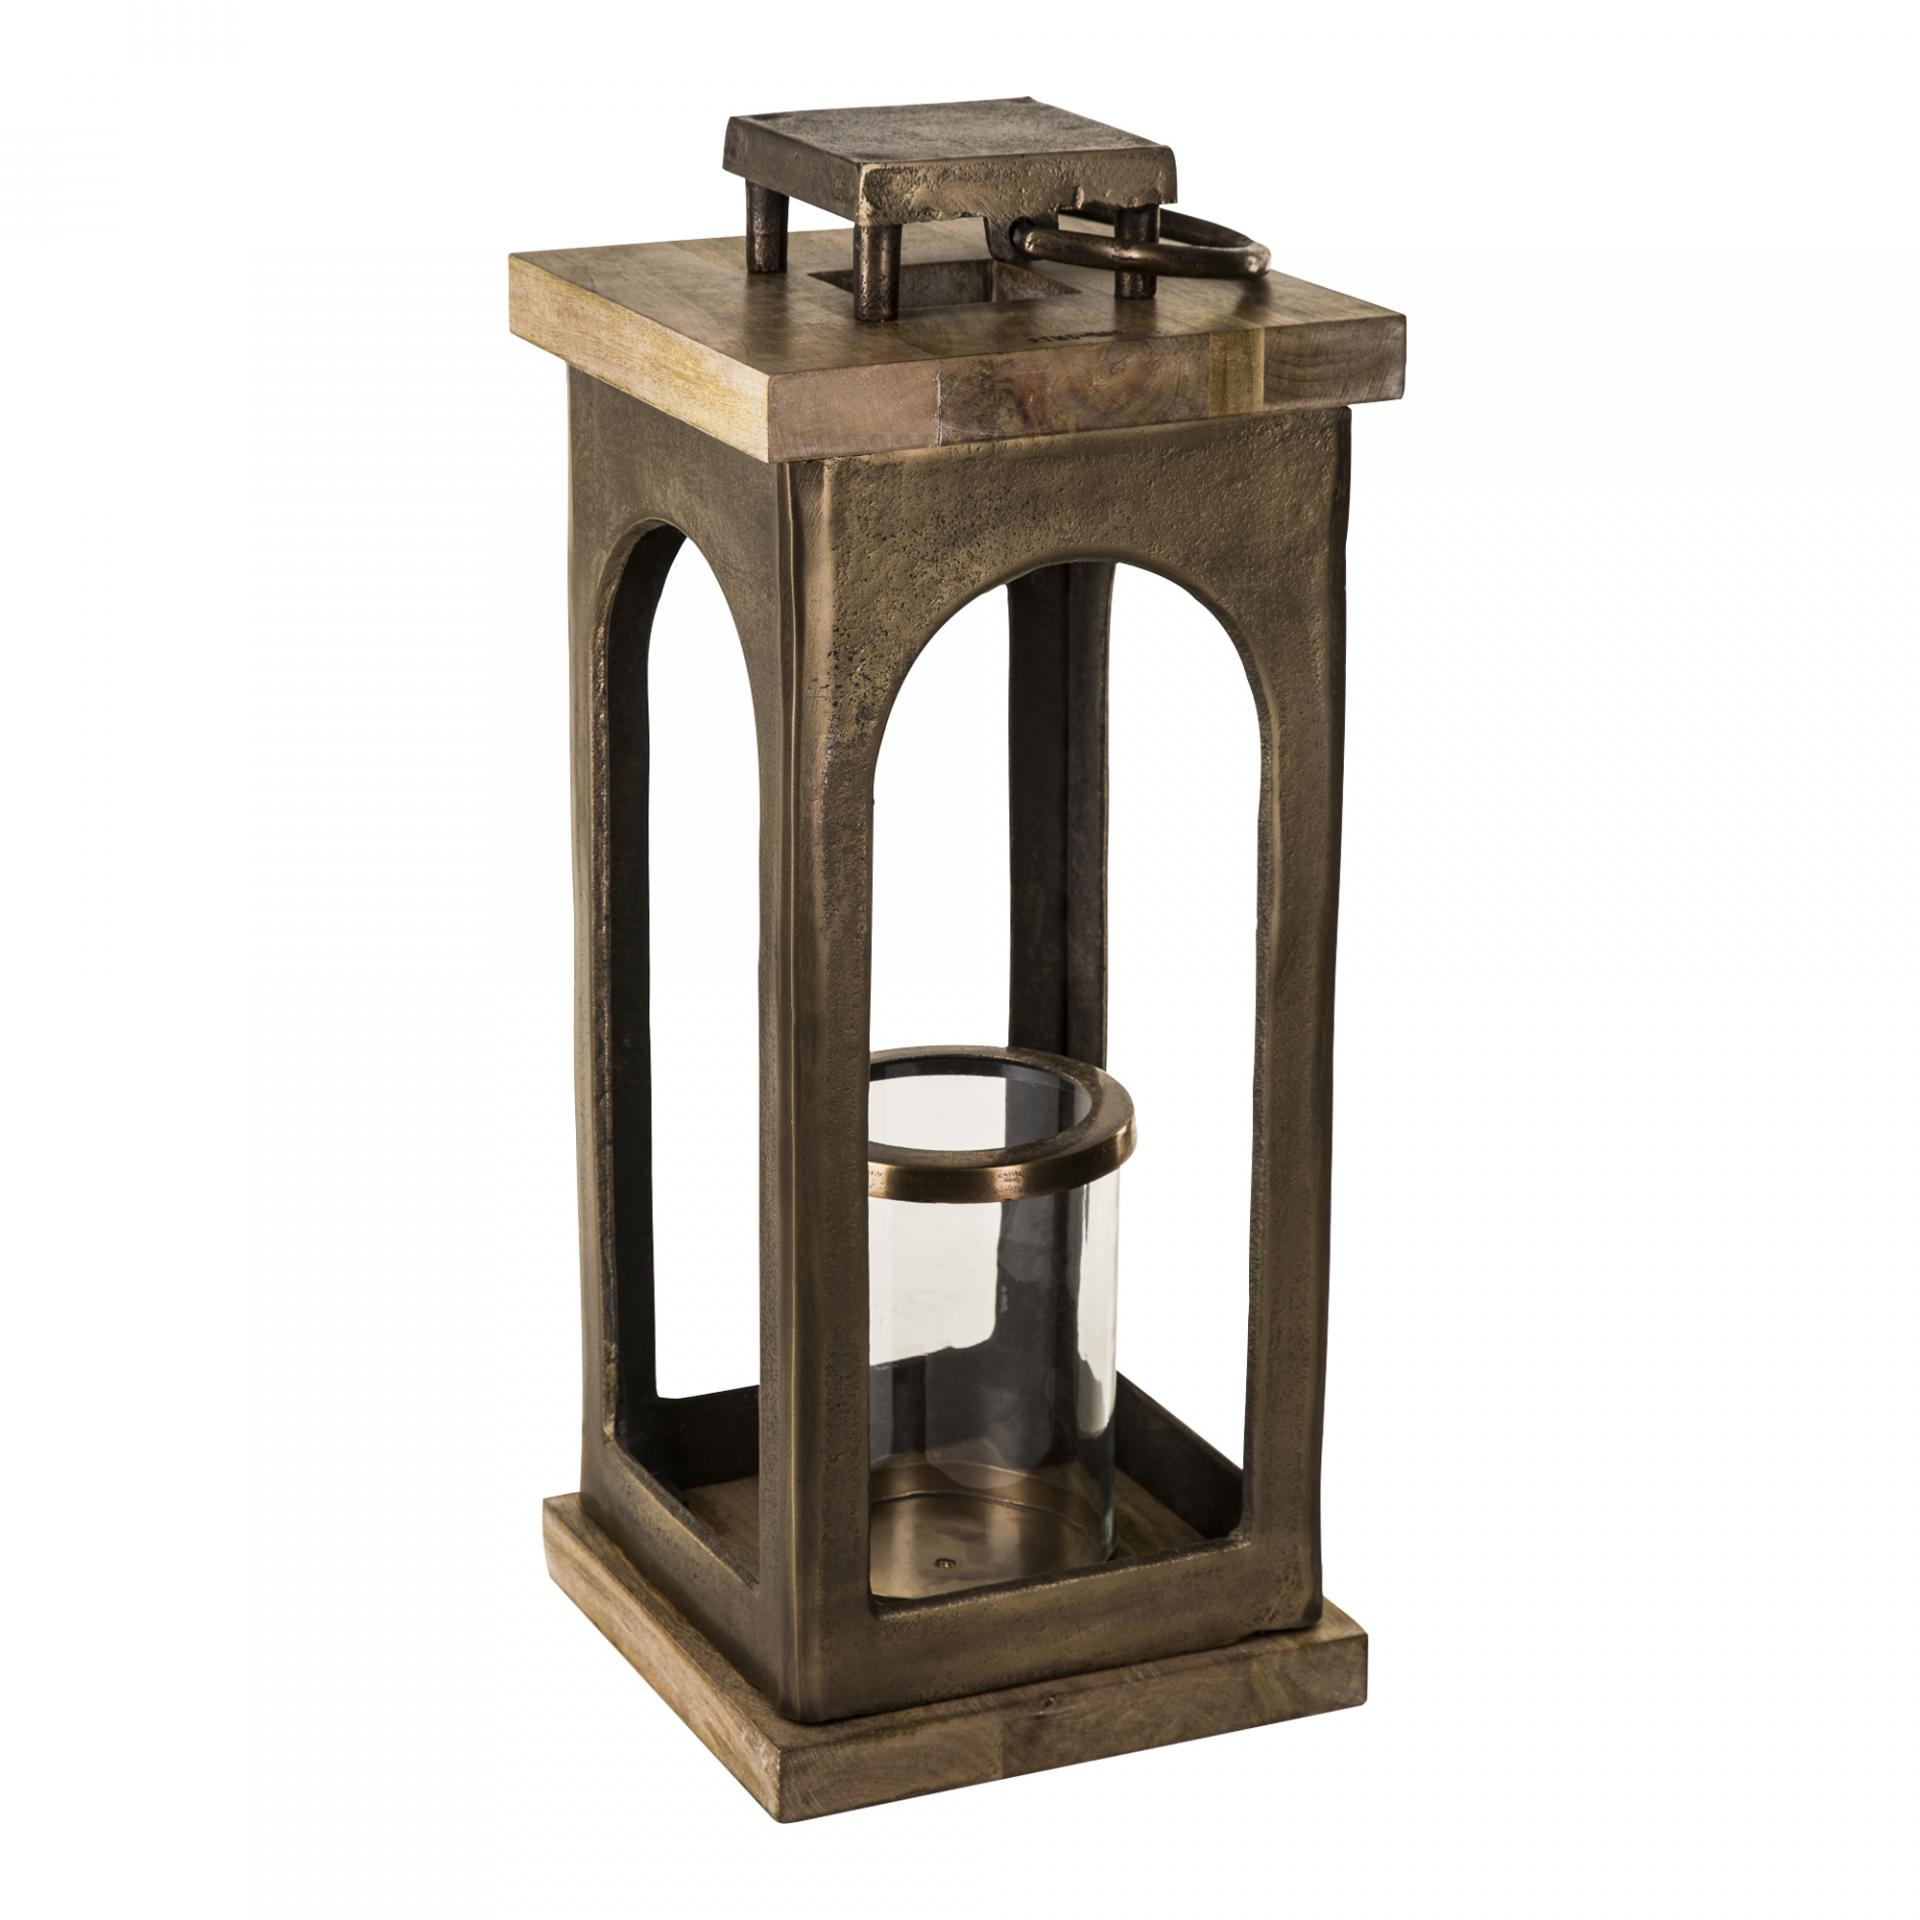 PTMD665169 Alu Brass Lantern